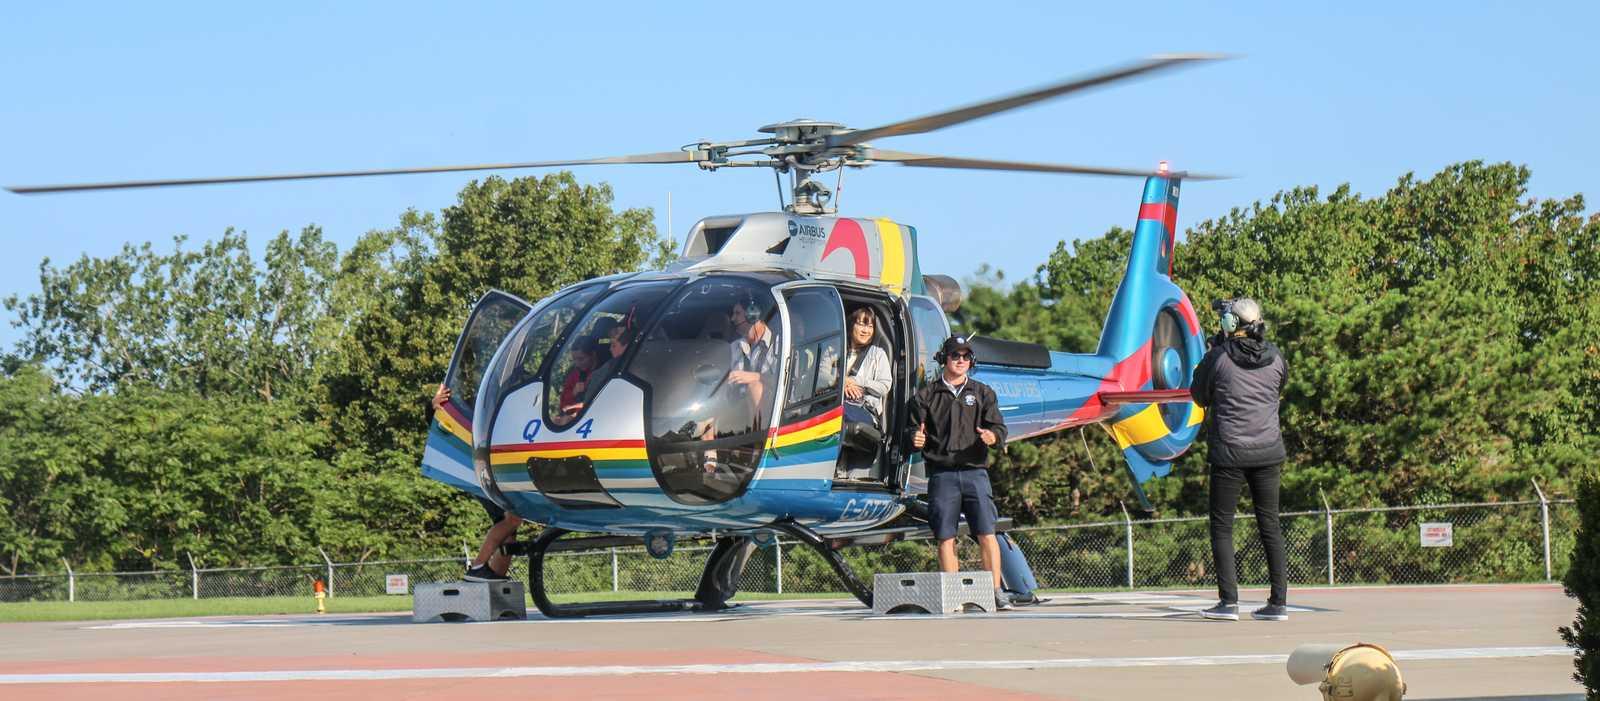 Helikopter Rundflug über die Niagarafälle